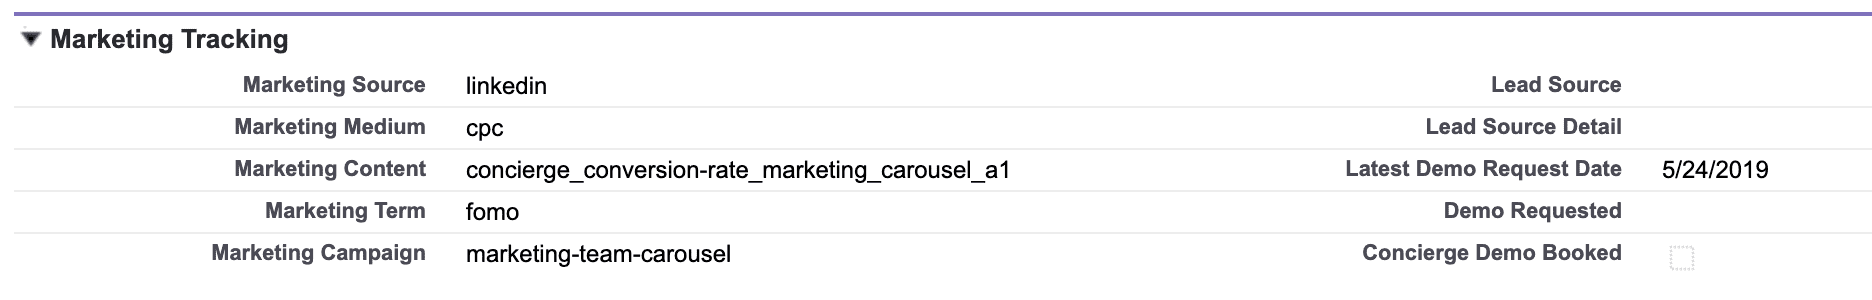 New marketing attribution fields in Salesforce.